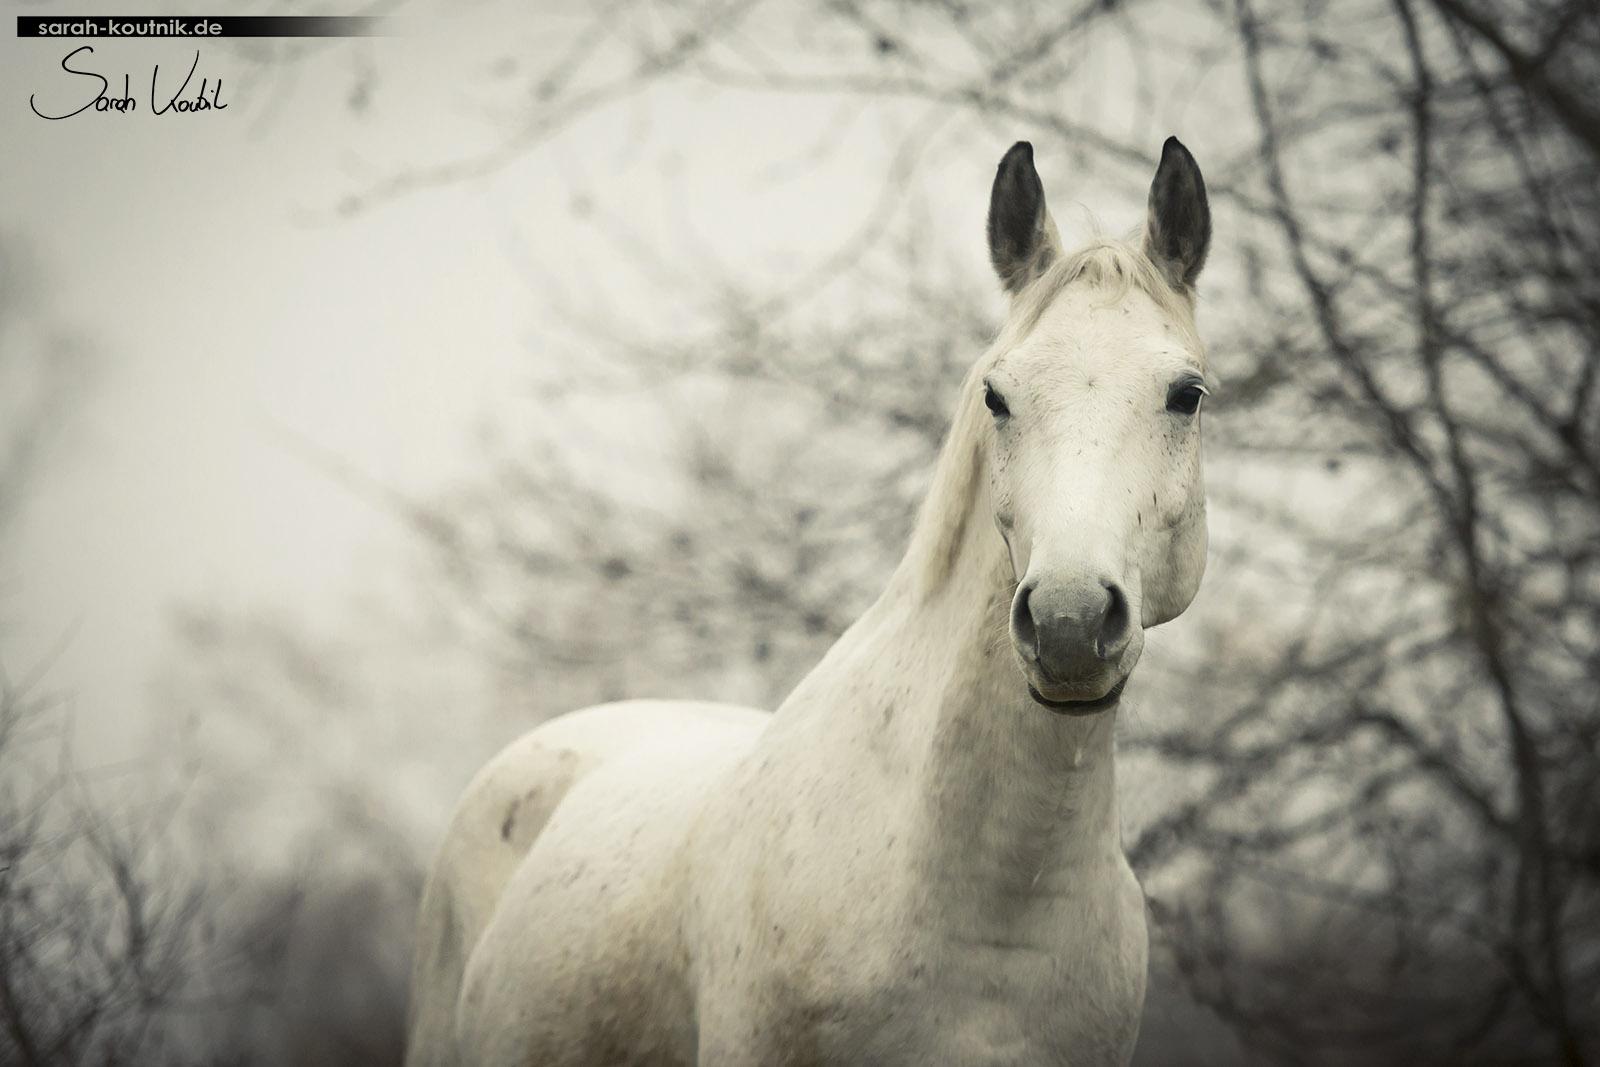 Schimmel Finn im Nebel | Pferdefotografie München | Sarah Koutnik Fotografie